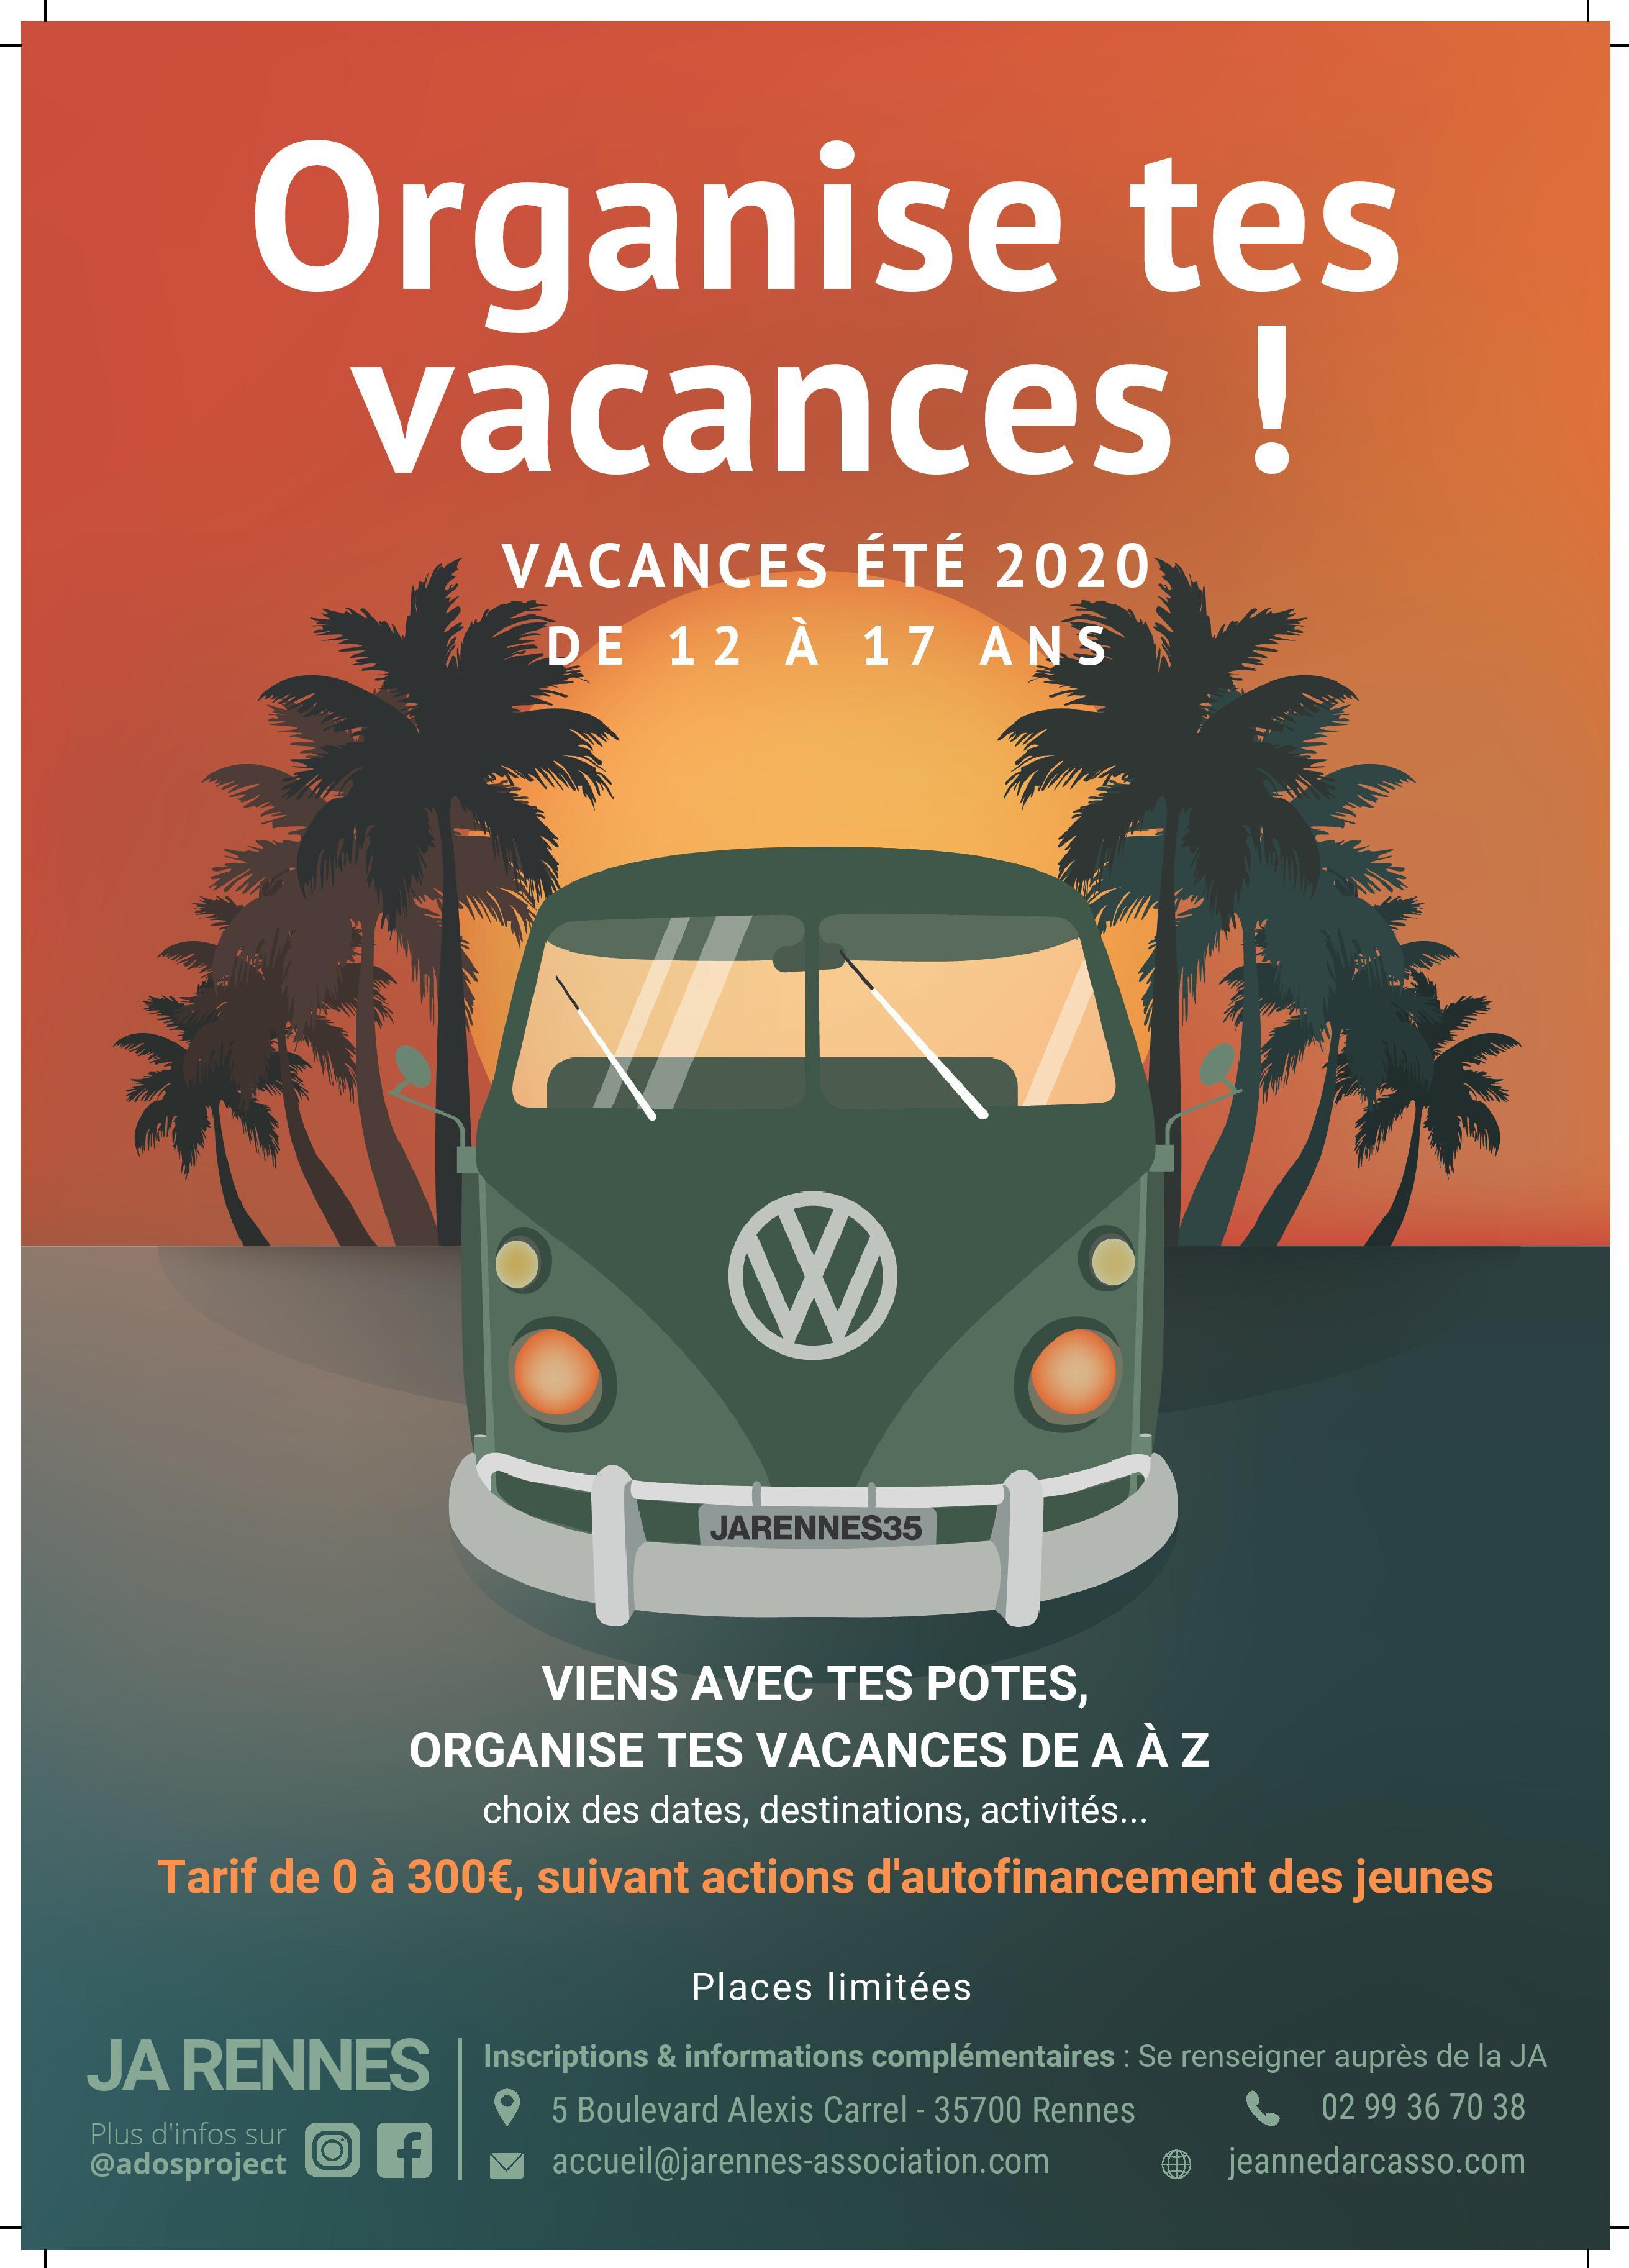 Organise Tes Vacances 2020